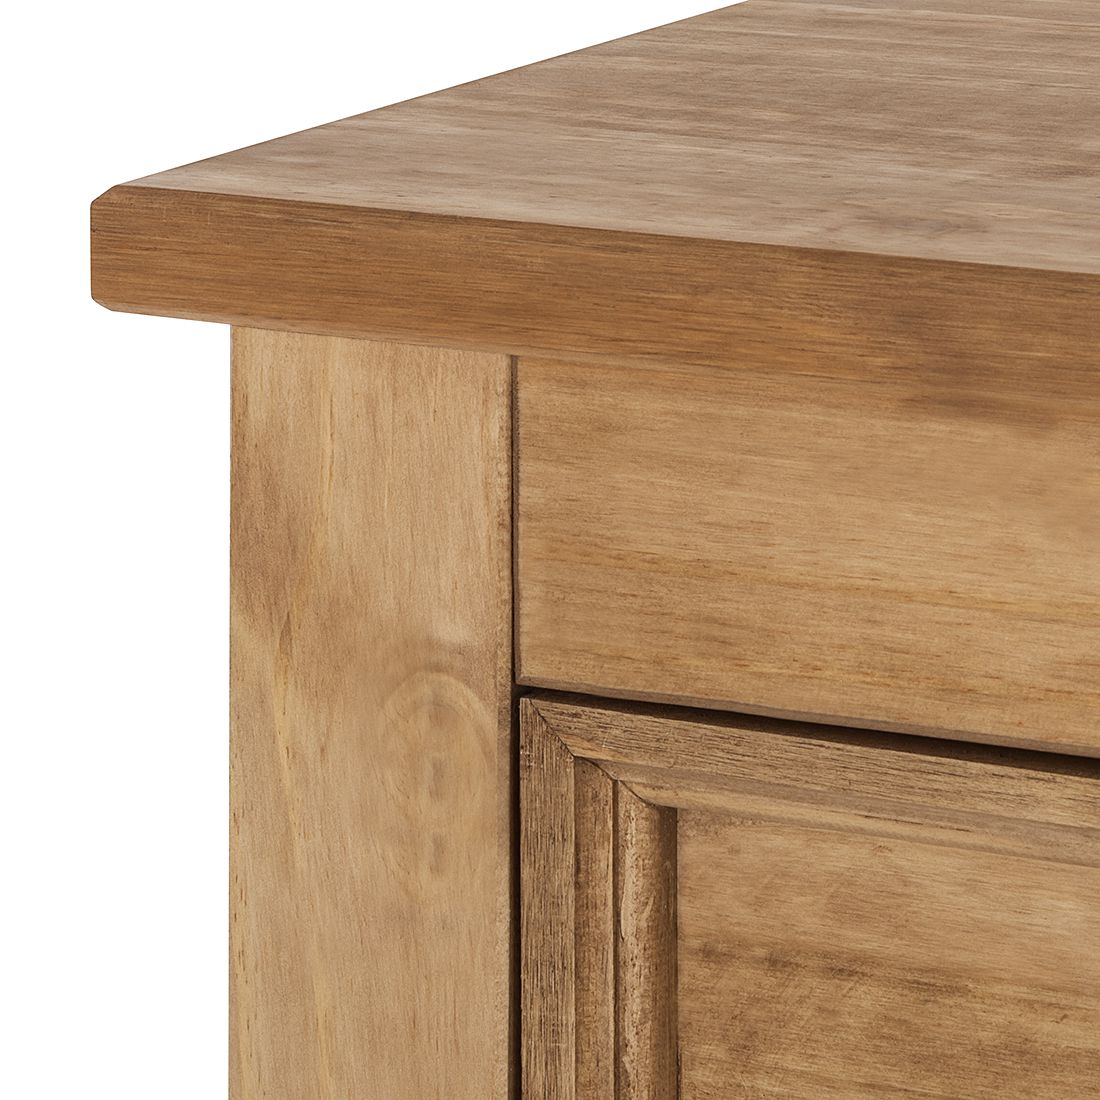 schuhschrank finca rustica kiefer schuhkommode schuhkipper schuh schrank ebay. Black Bedroom Furniture Sets. Home Design Ideas